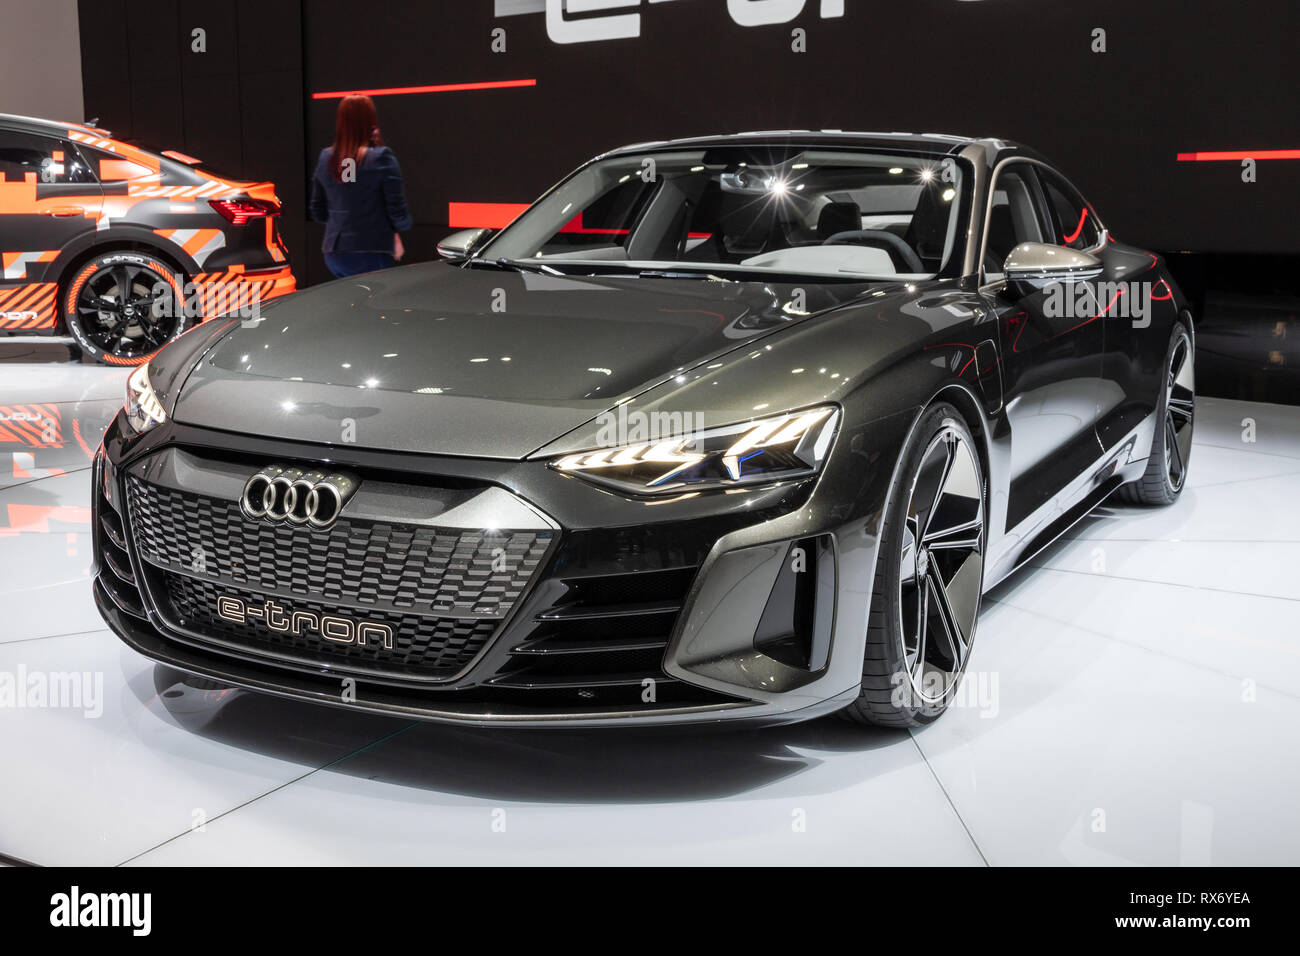 Geneva Switzerland March 6 2019 Audi E Tron Gt Concept Car Showcased At The 89th Geneva International Motor Show Stock Photo Alamy